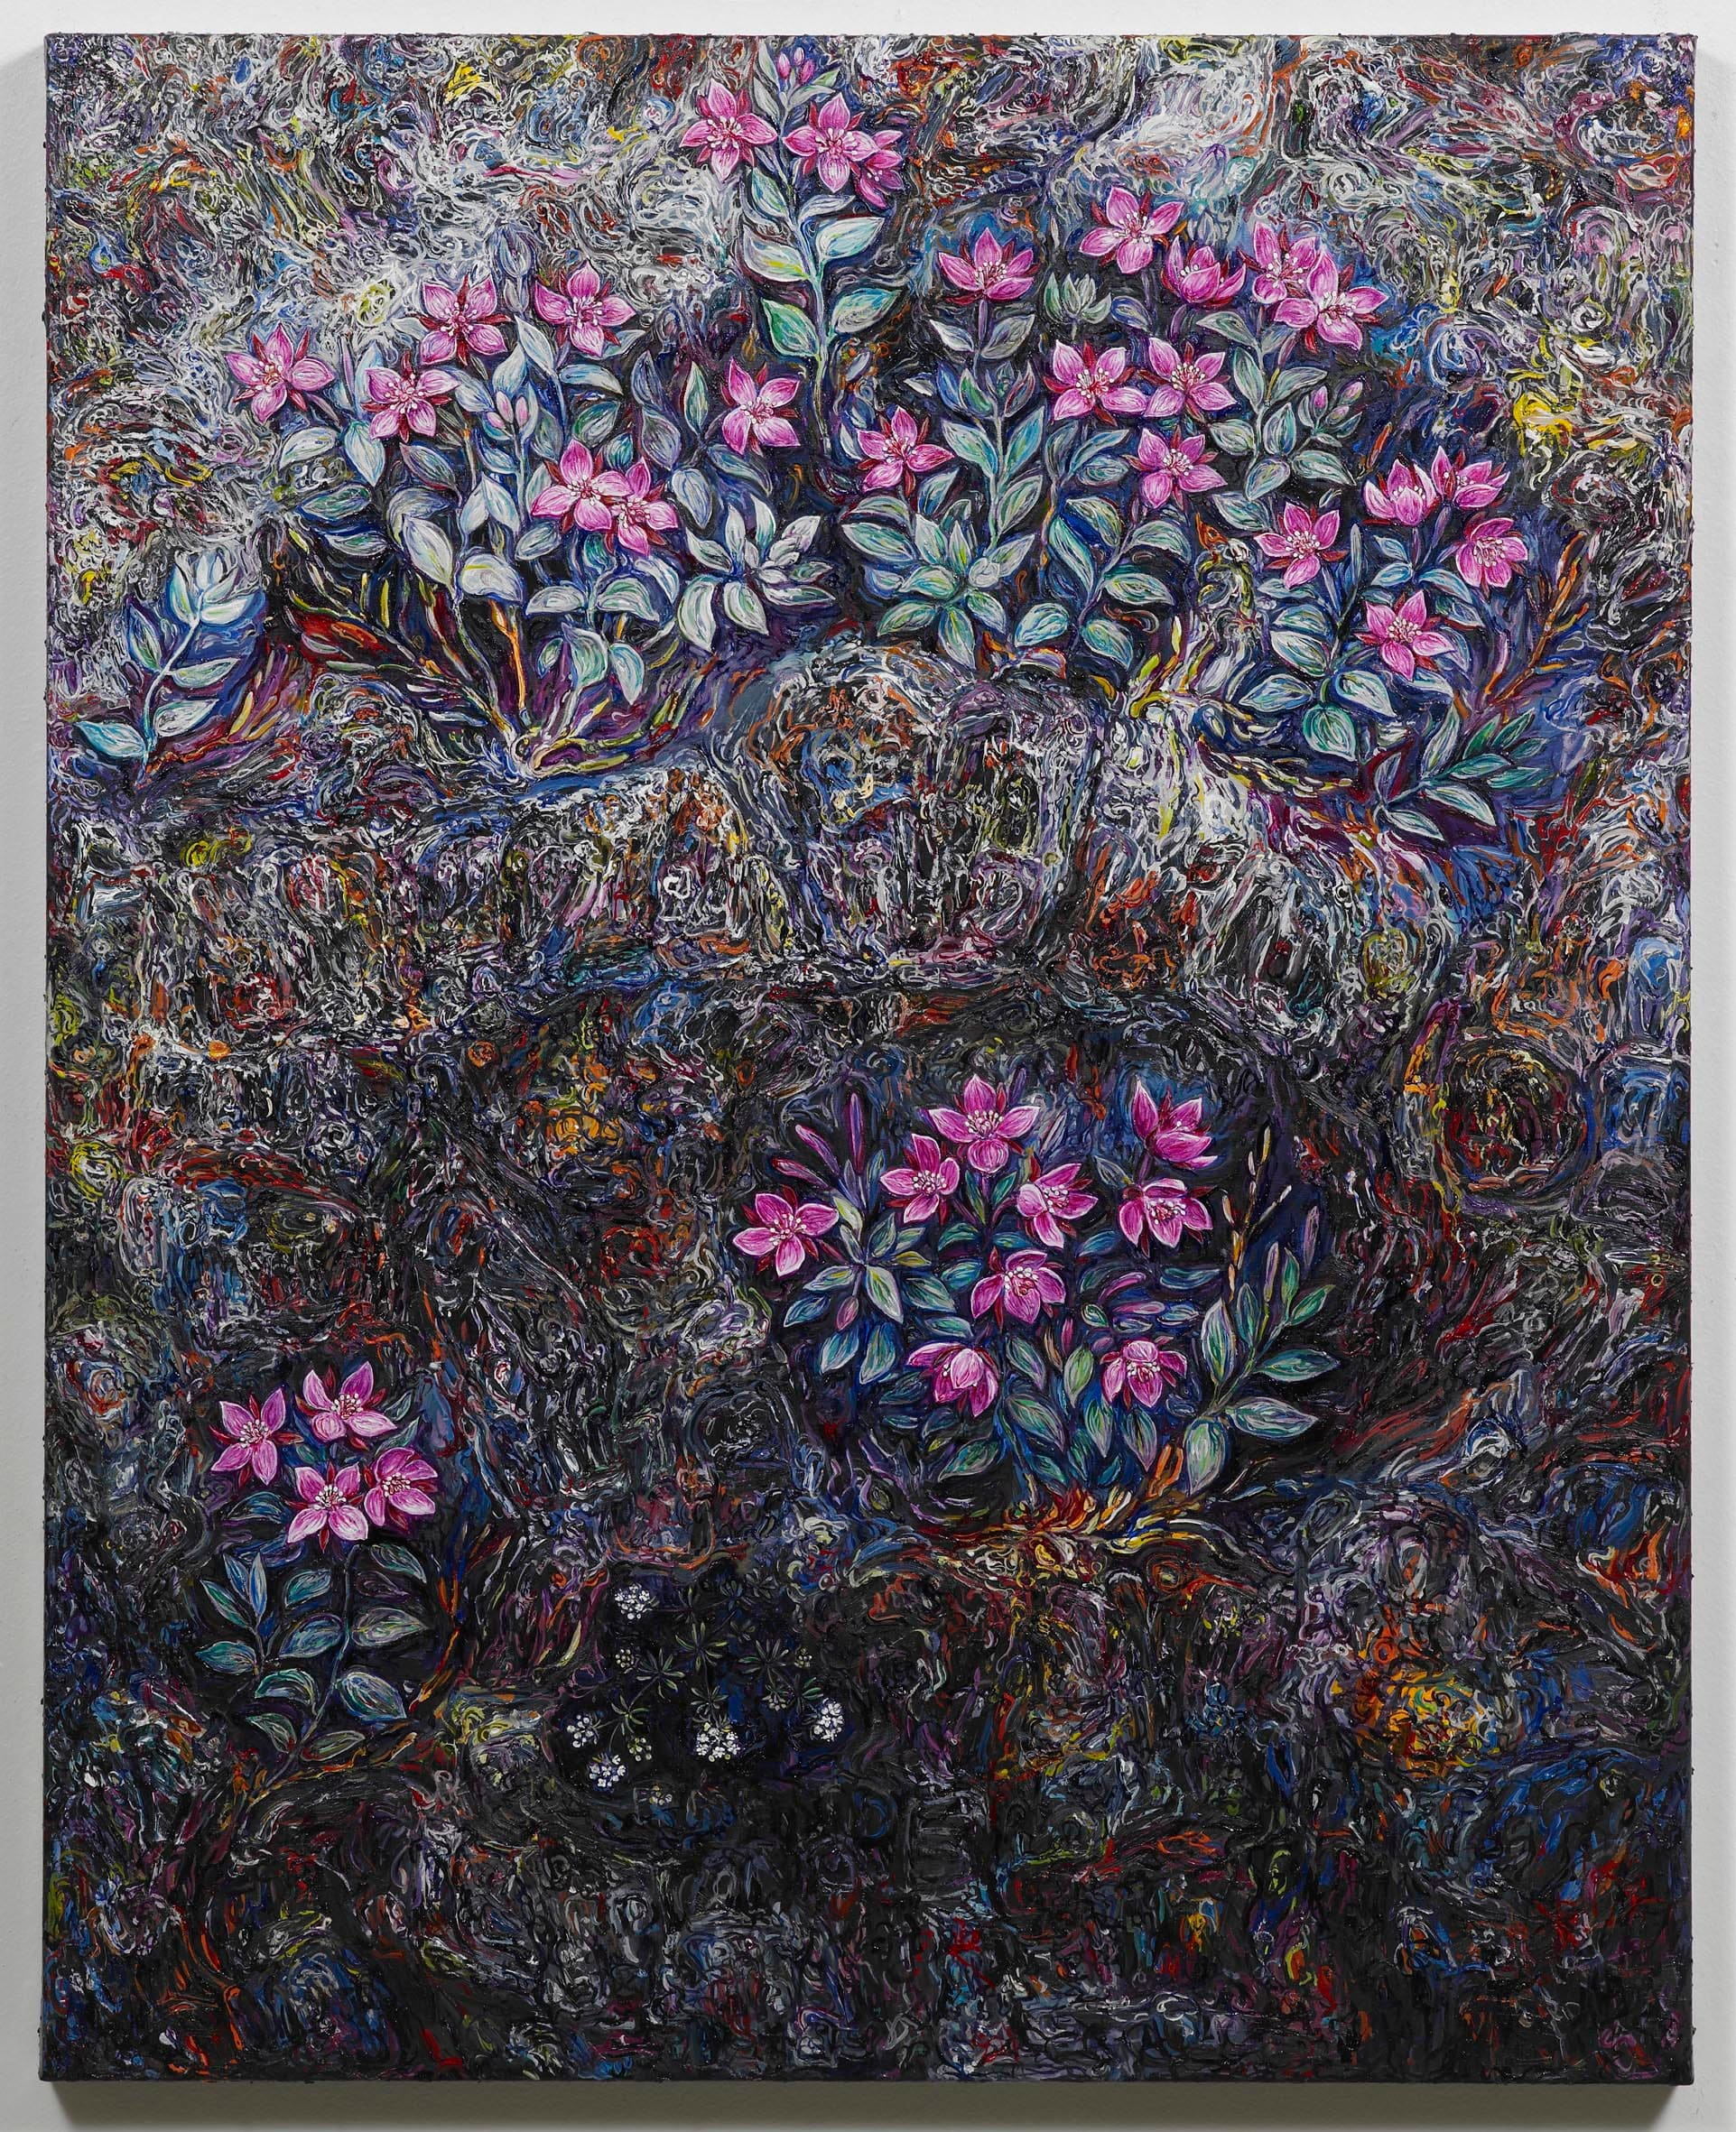 "<span class=""link fancybox-details-link""><a href=""/exhibitions/128/works/artworks8847/"">View Detail Page</a></span><div class=""artist""><strong>EGGERT PÉTURSSON</strong></div><div class=""title""><em>Untitled / Án titils (Eyrarrós)</em>, 2011-2012</div><div class=""signed_and_dated"">signed on back</div><div class=""medium"">oil on canvas / olía á striga</div><div class=""dimensions"">100.0 x 80.0 cm<br>39 1/8 x 31 3/16 in</div>"